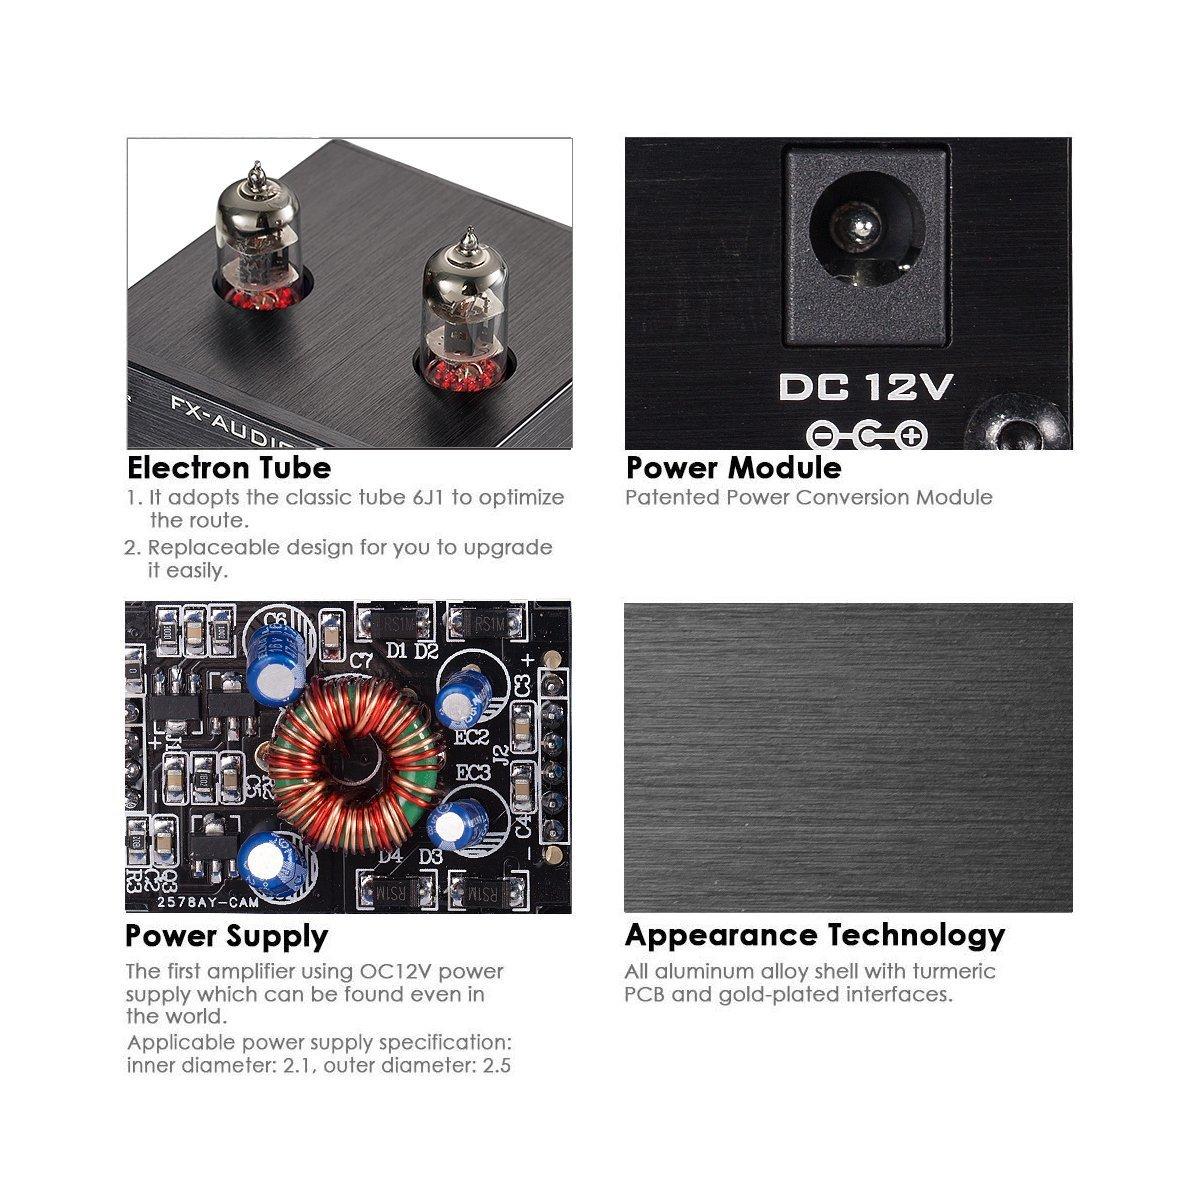 FEIXIANG 6J1-Black Mini 6J1 - Válvula y tubo de vacío pre ...